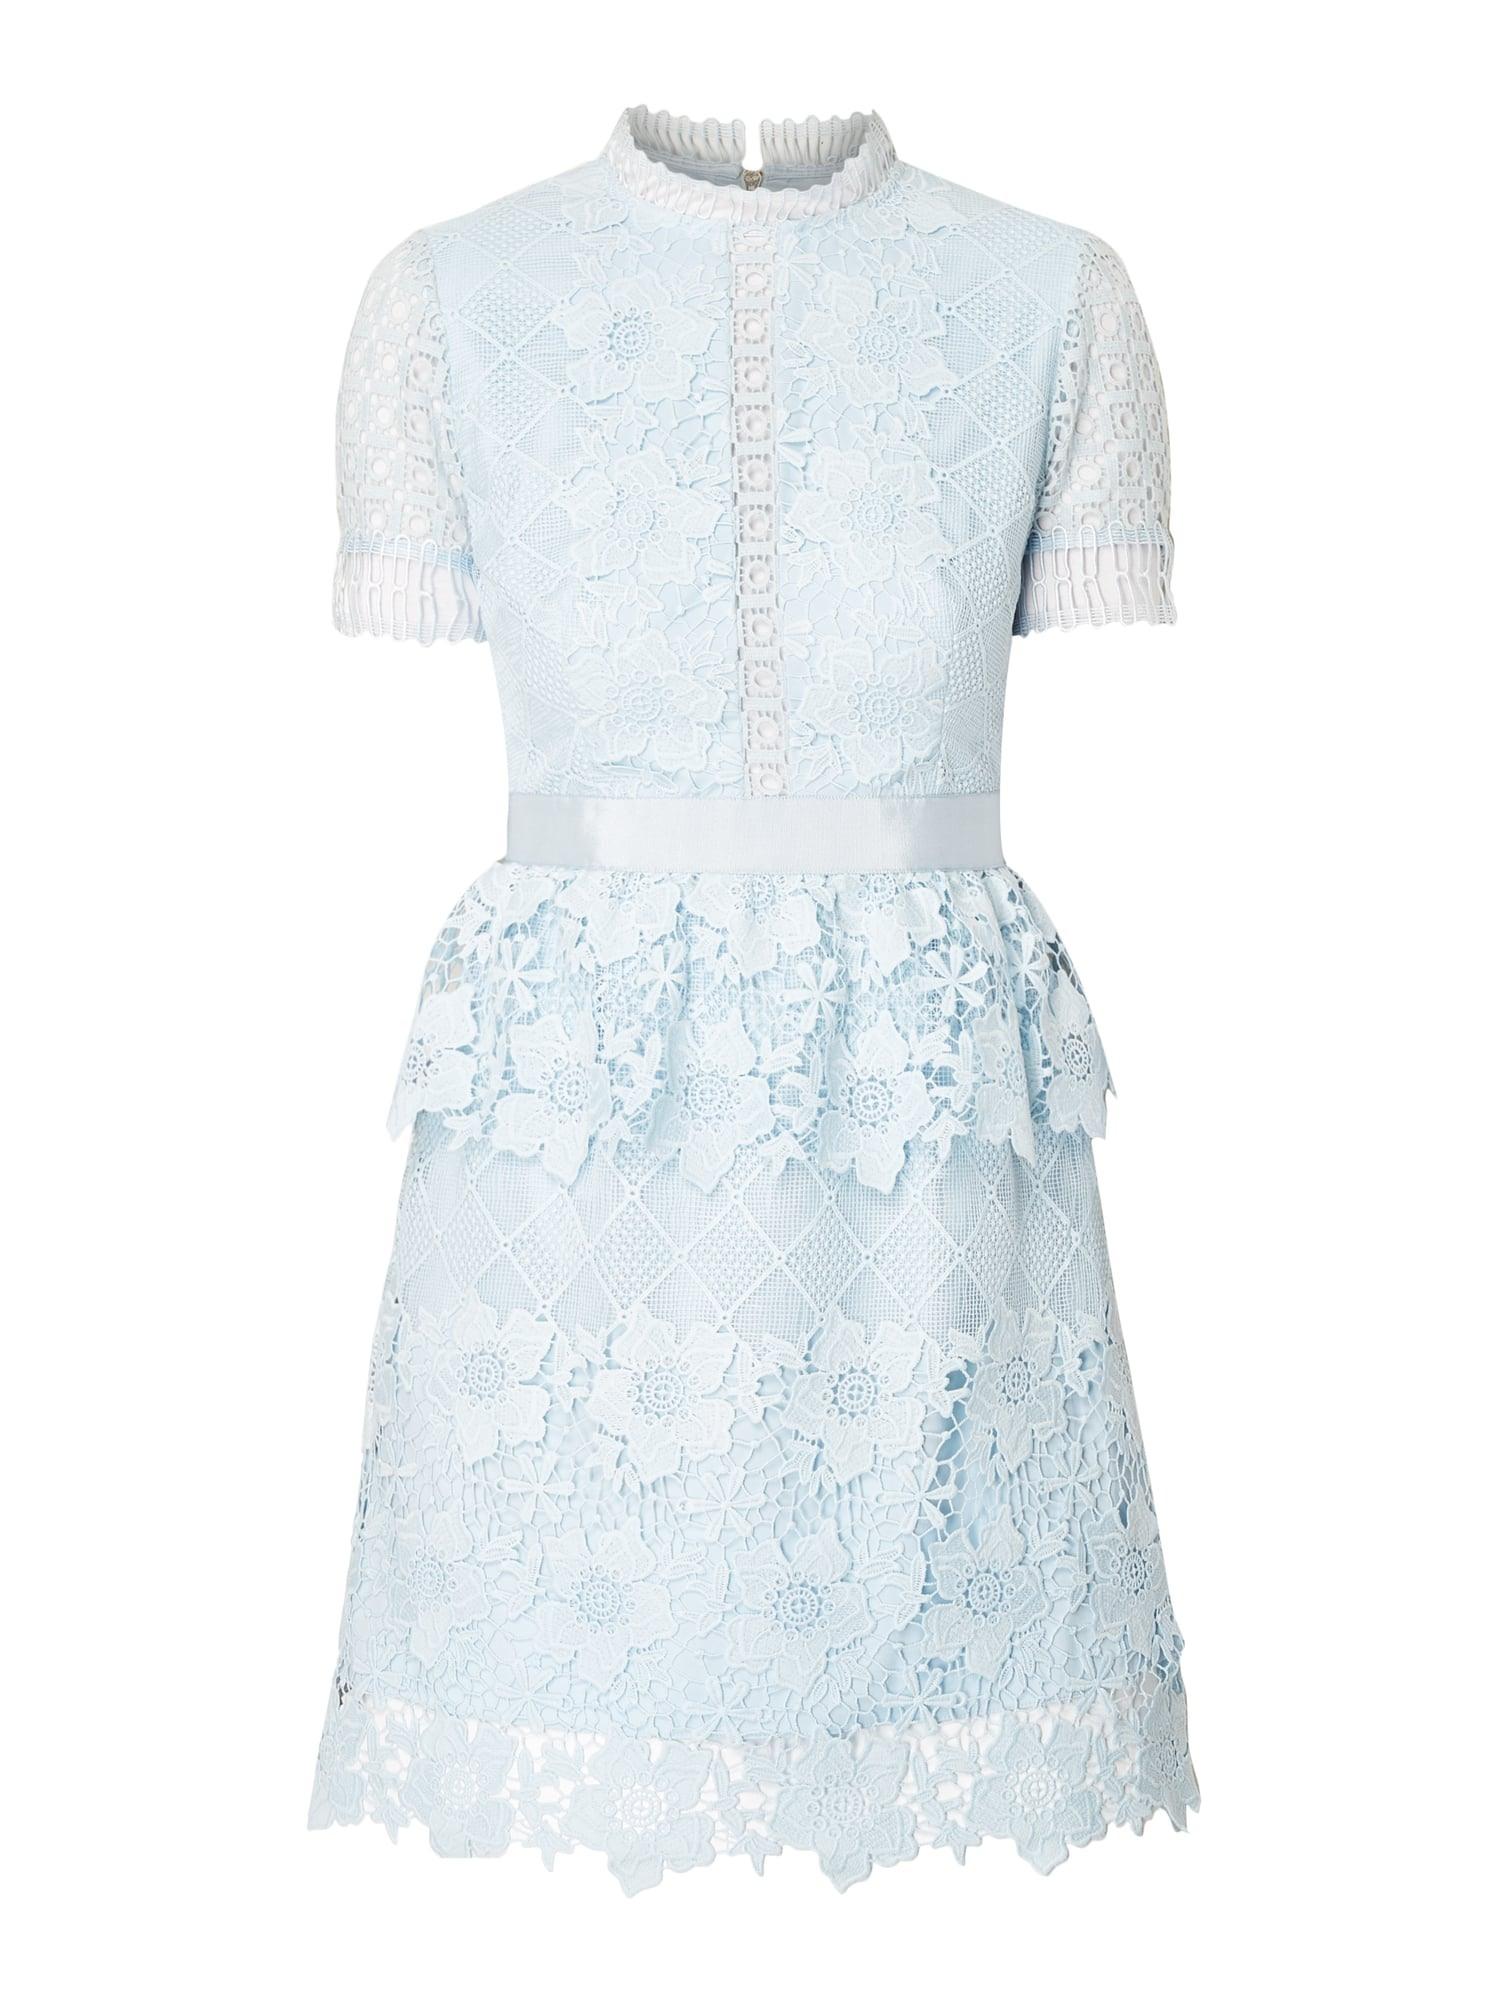 10 Schön Kleid Spitze Hellblau Spezialgebiet10 Luxurius Kleid Spitze Hellblau Spezialgebiet